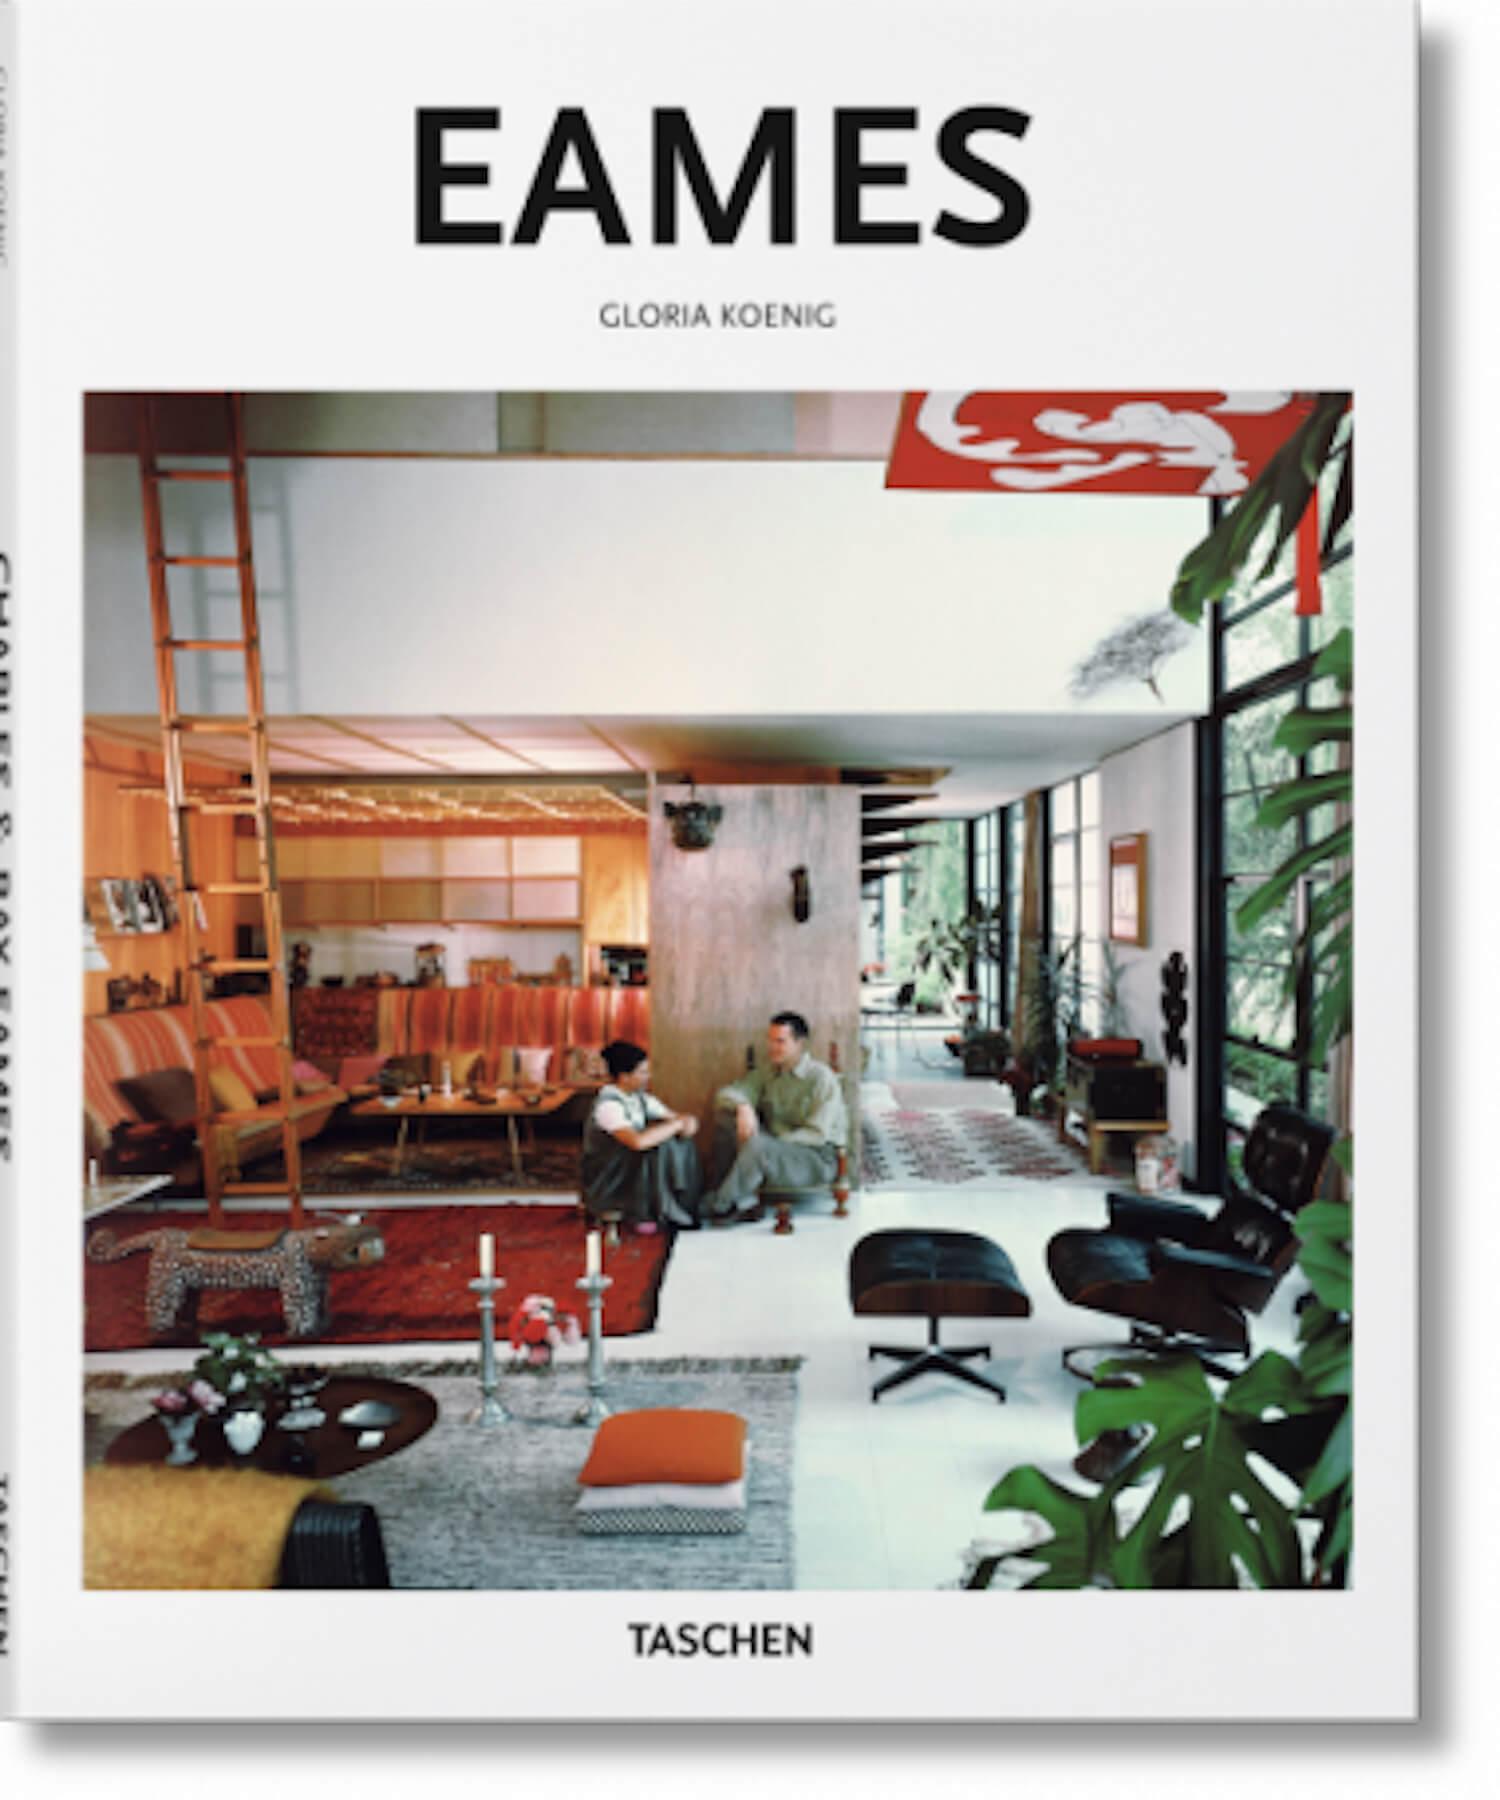 est living design devotee gift guide eames book